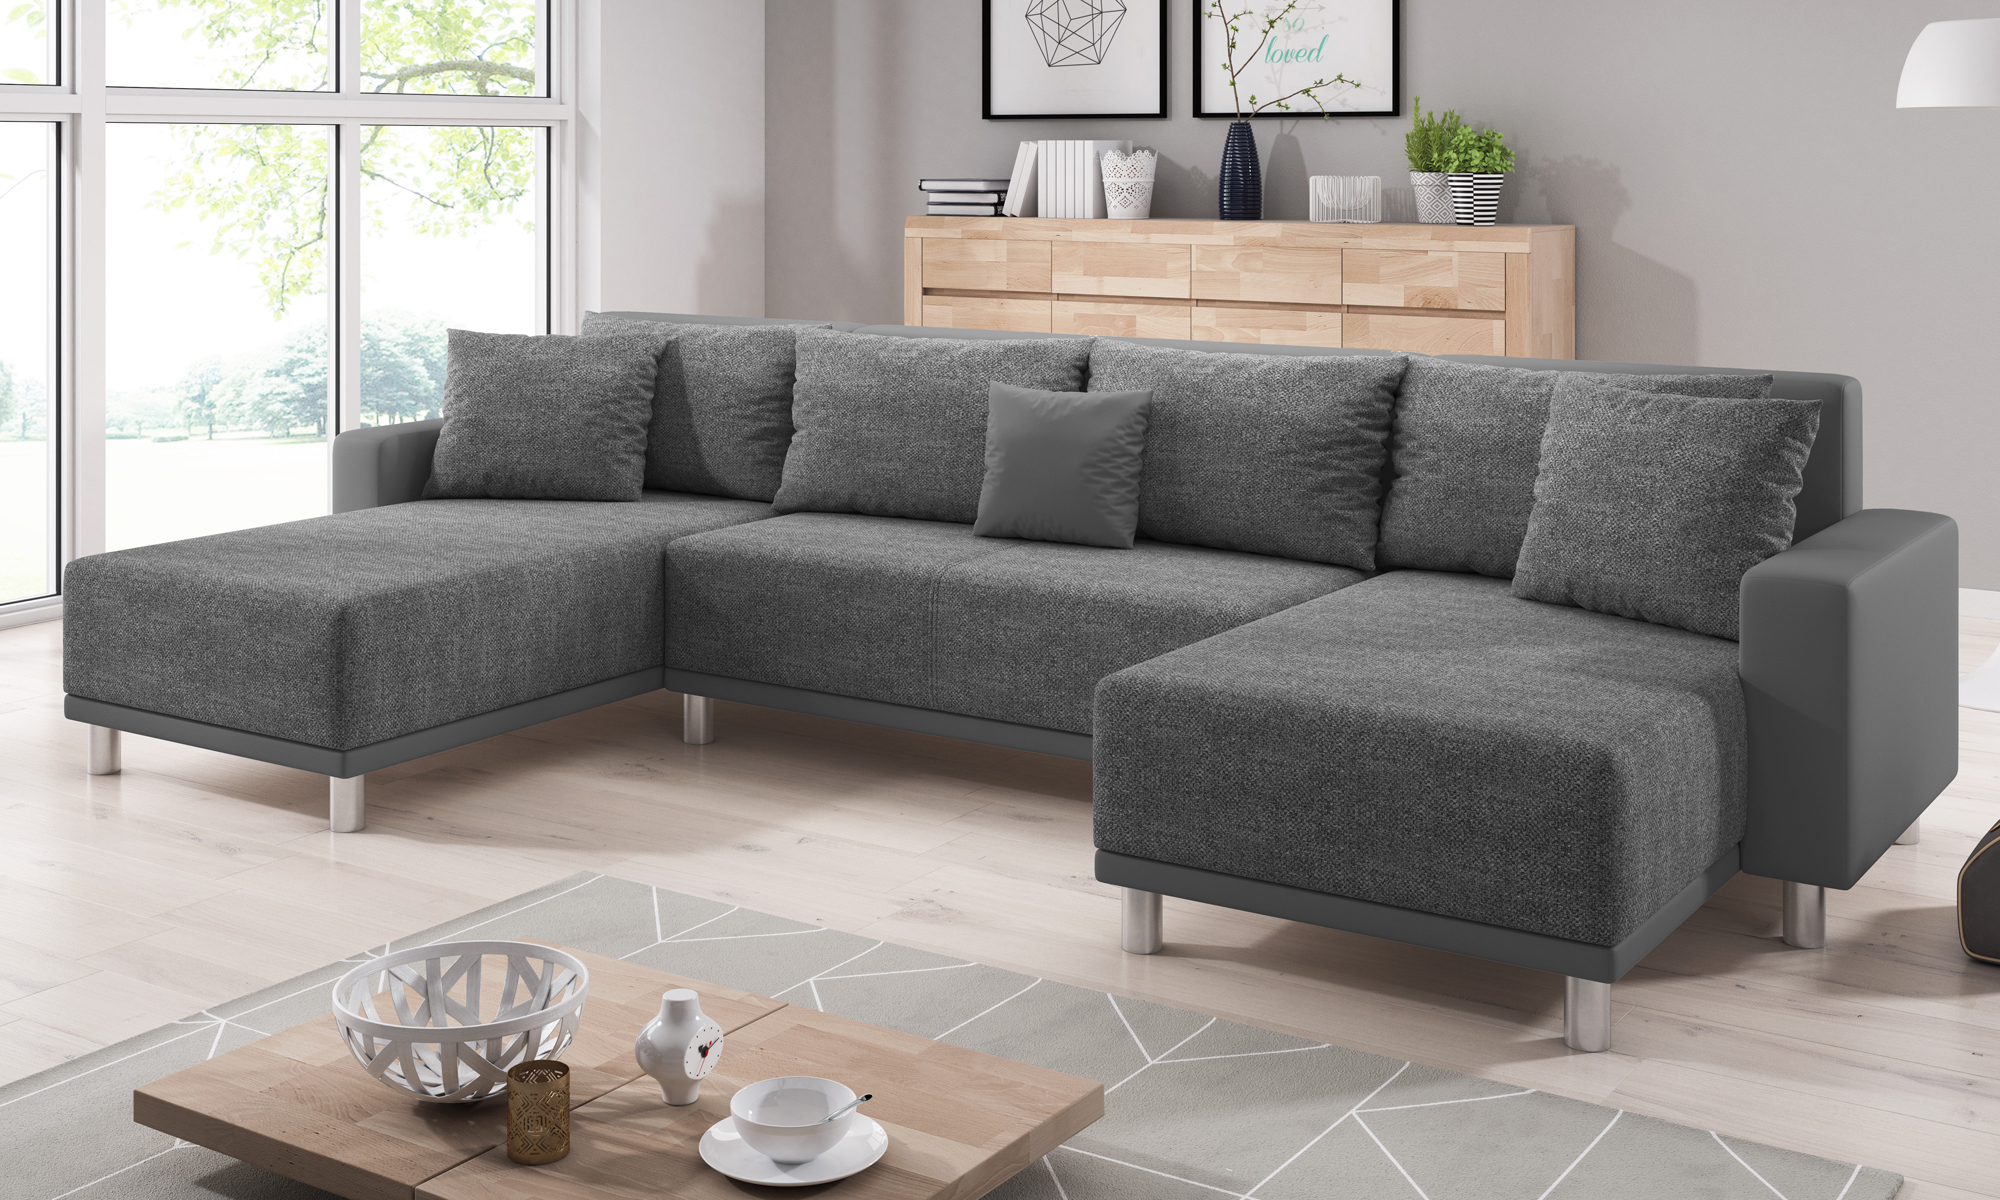 sofa road grau u form schlafsofa ecksofa wohnen polsterm bel ecksofa. Black Bedroom Furniture Sets. Home Design Ideas